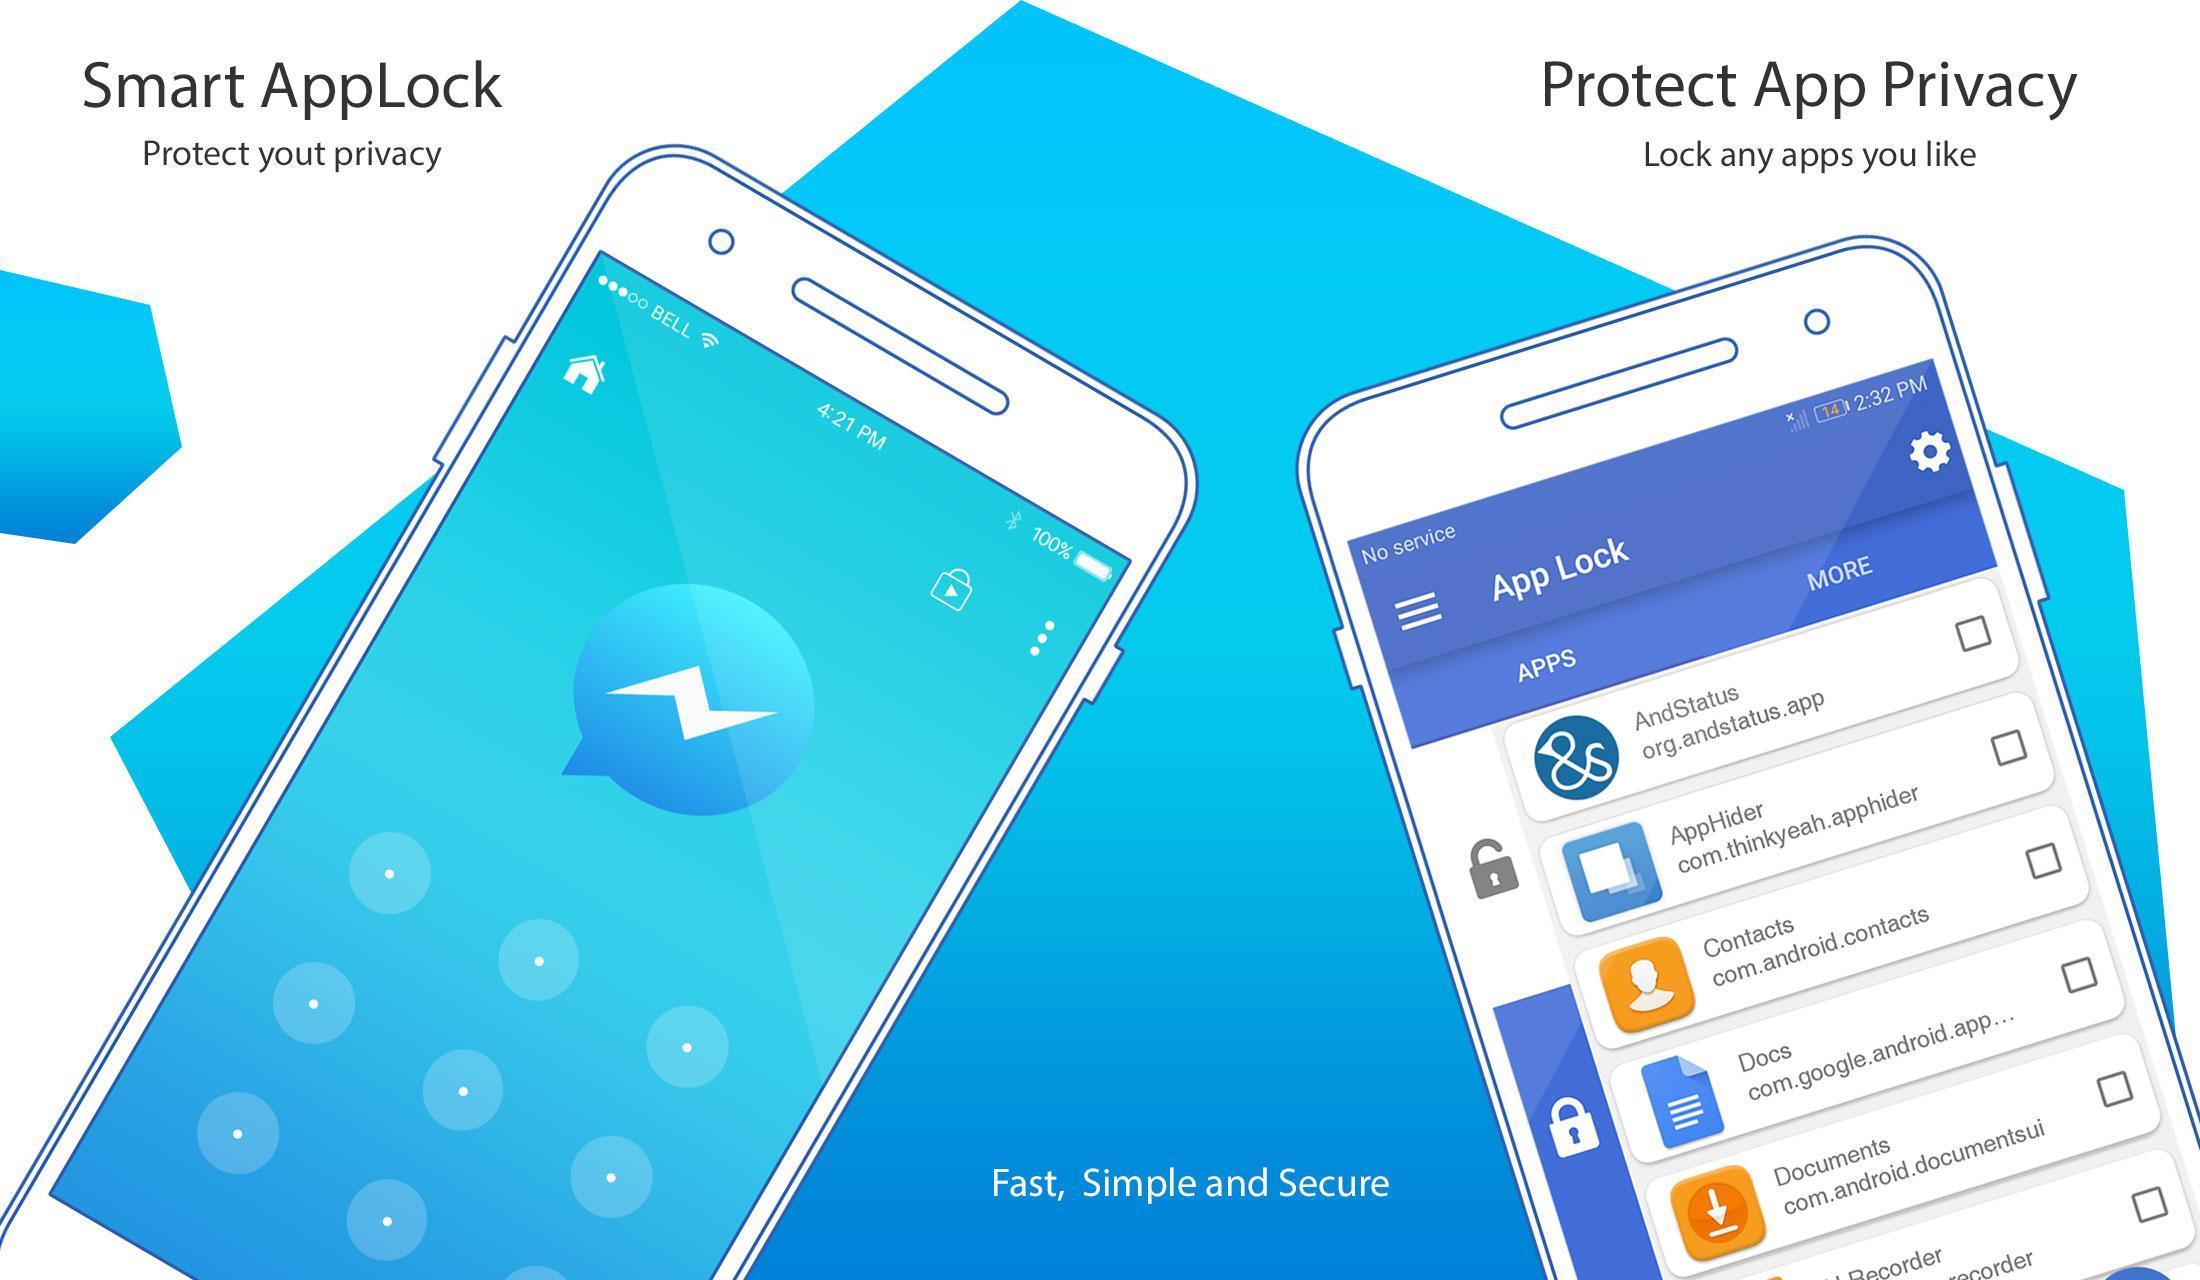 Secure App Lock 2018: Fingerprint Lock Apps for Android